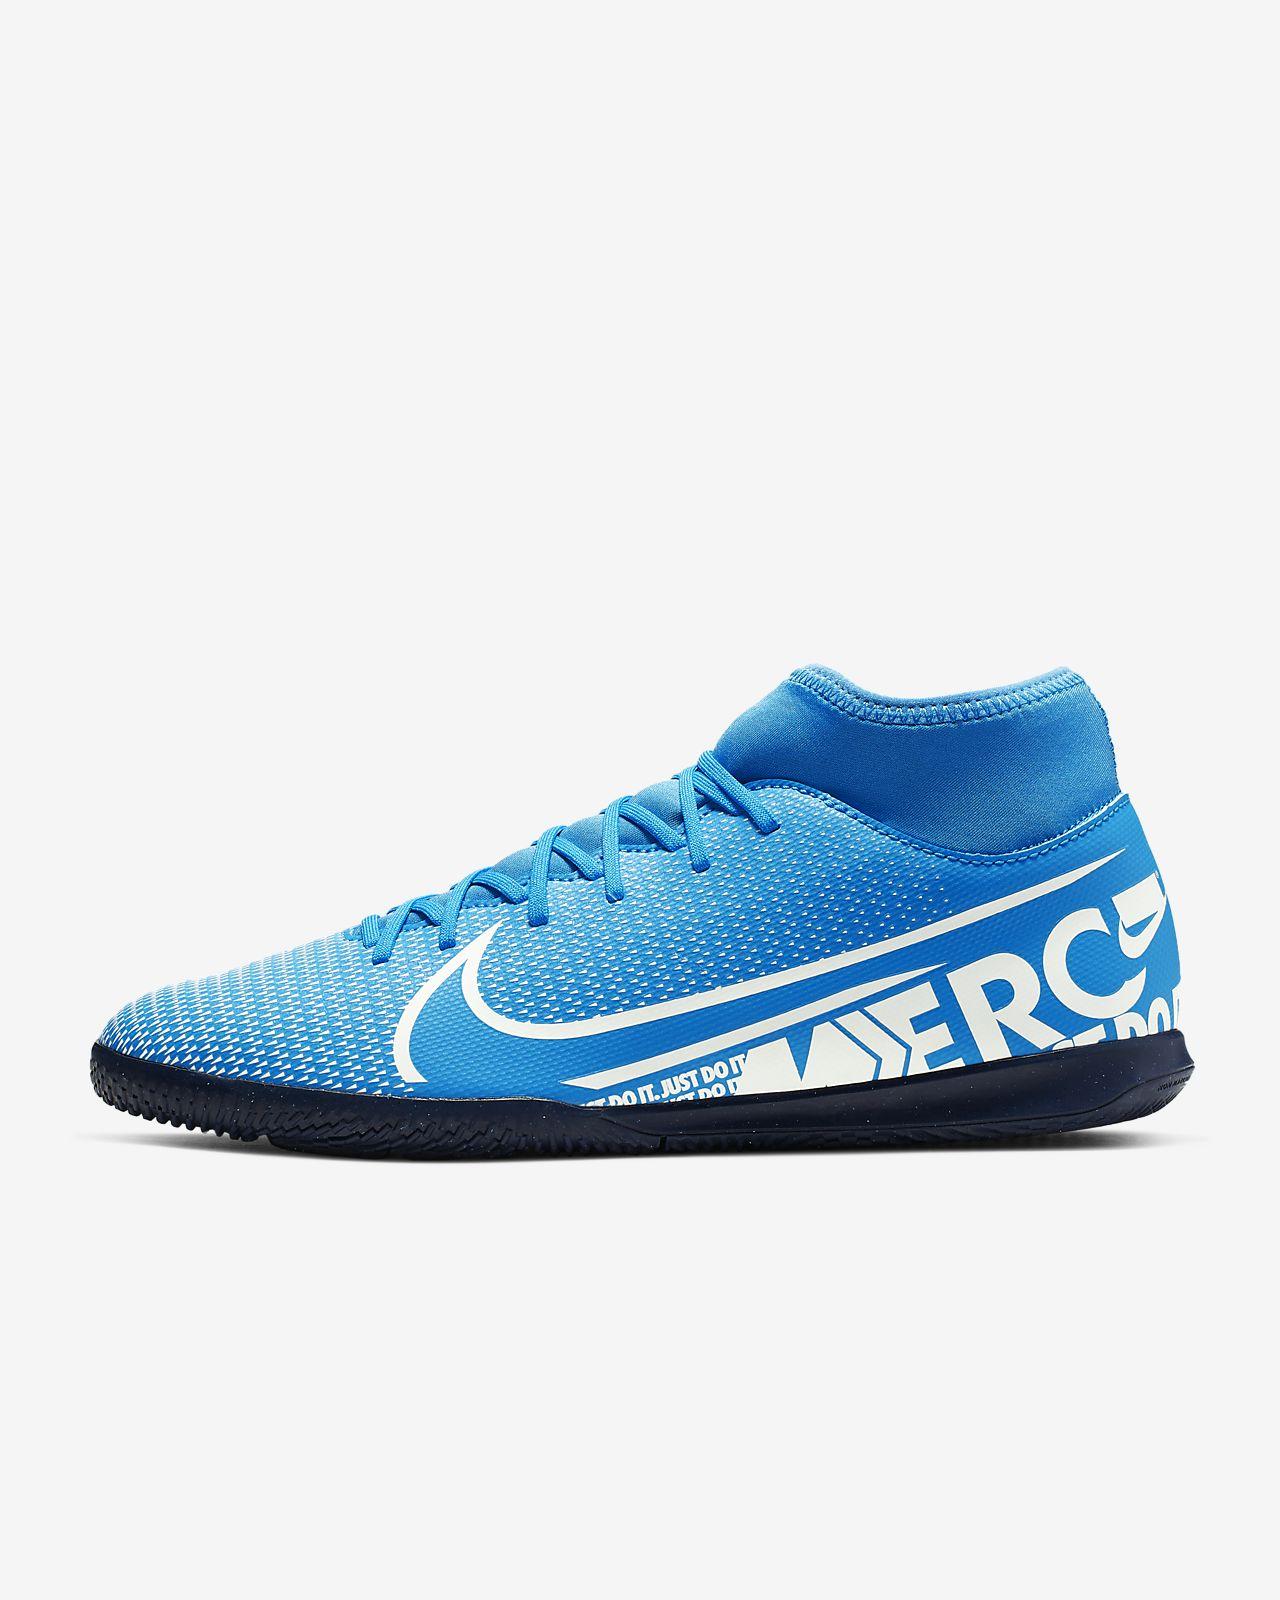 Fotbollssko för inomhusplaner/futsal Nike Mercurial Superfly 7 Club IC